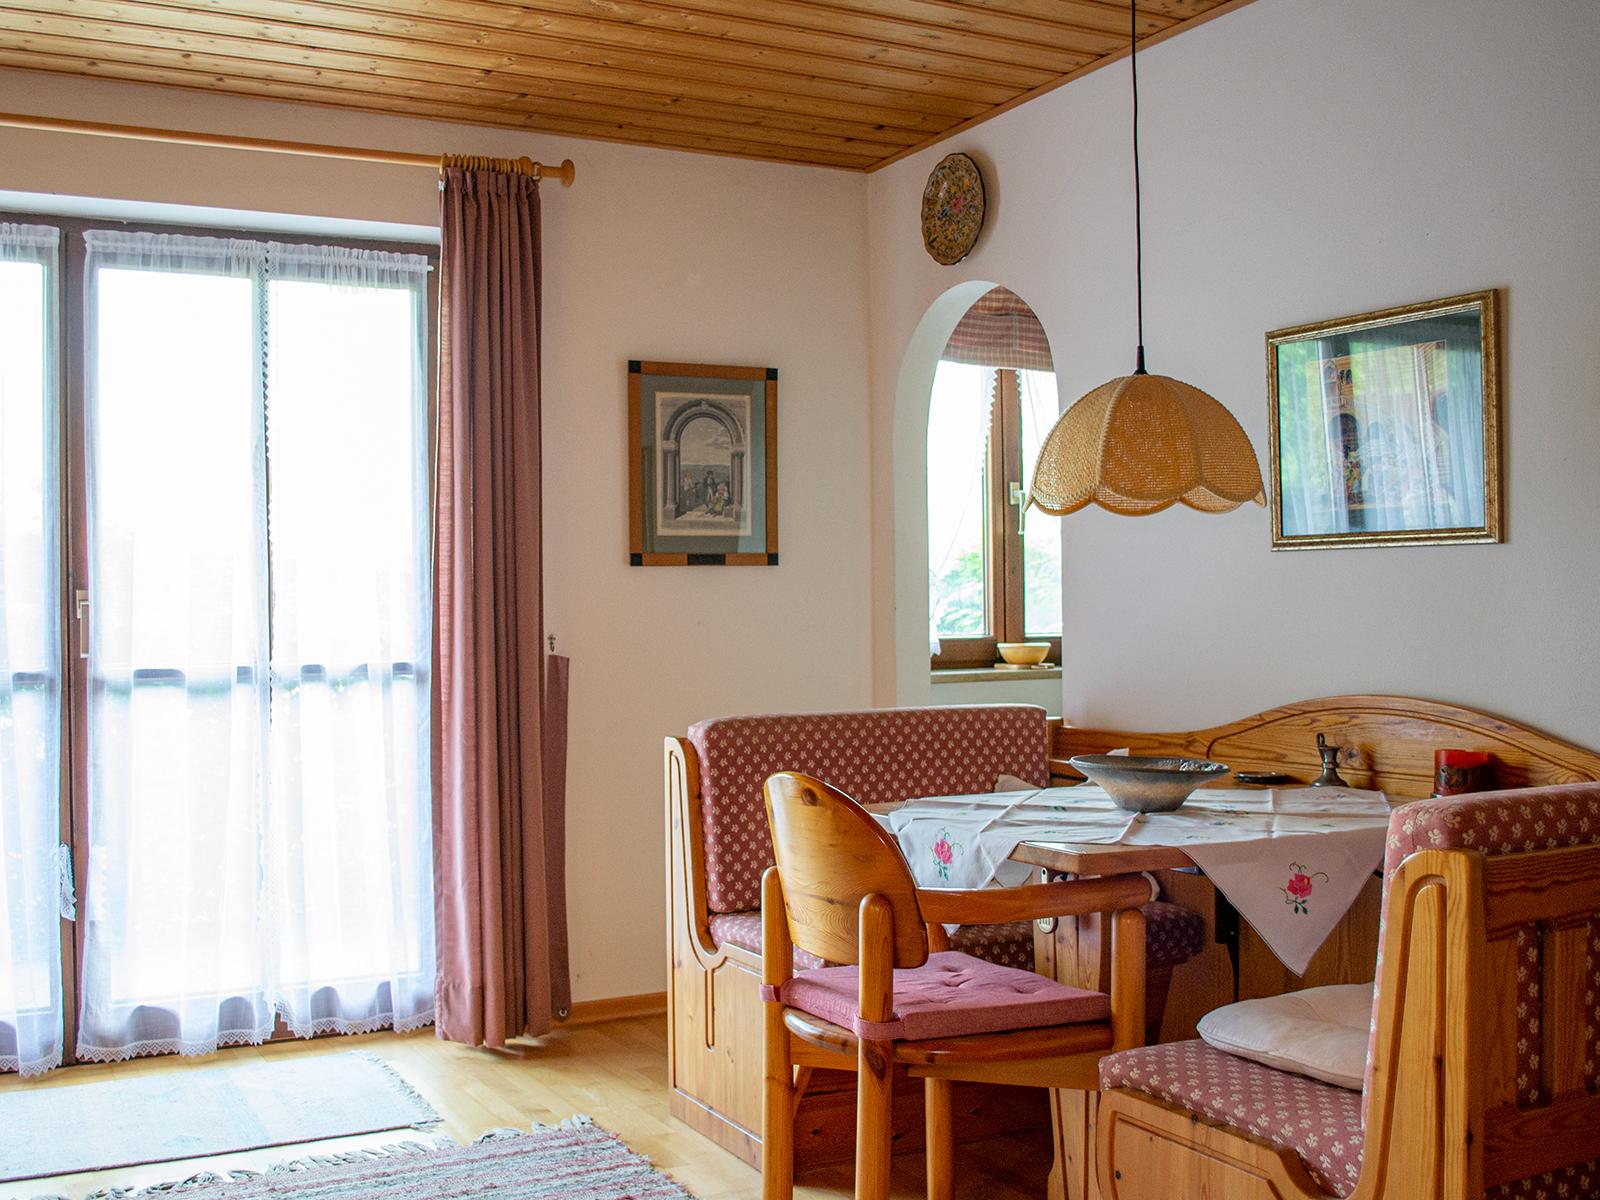 Appartement #1